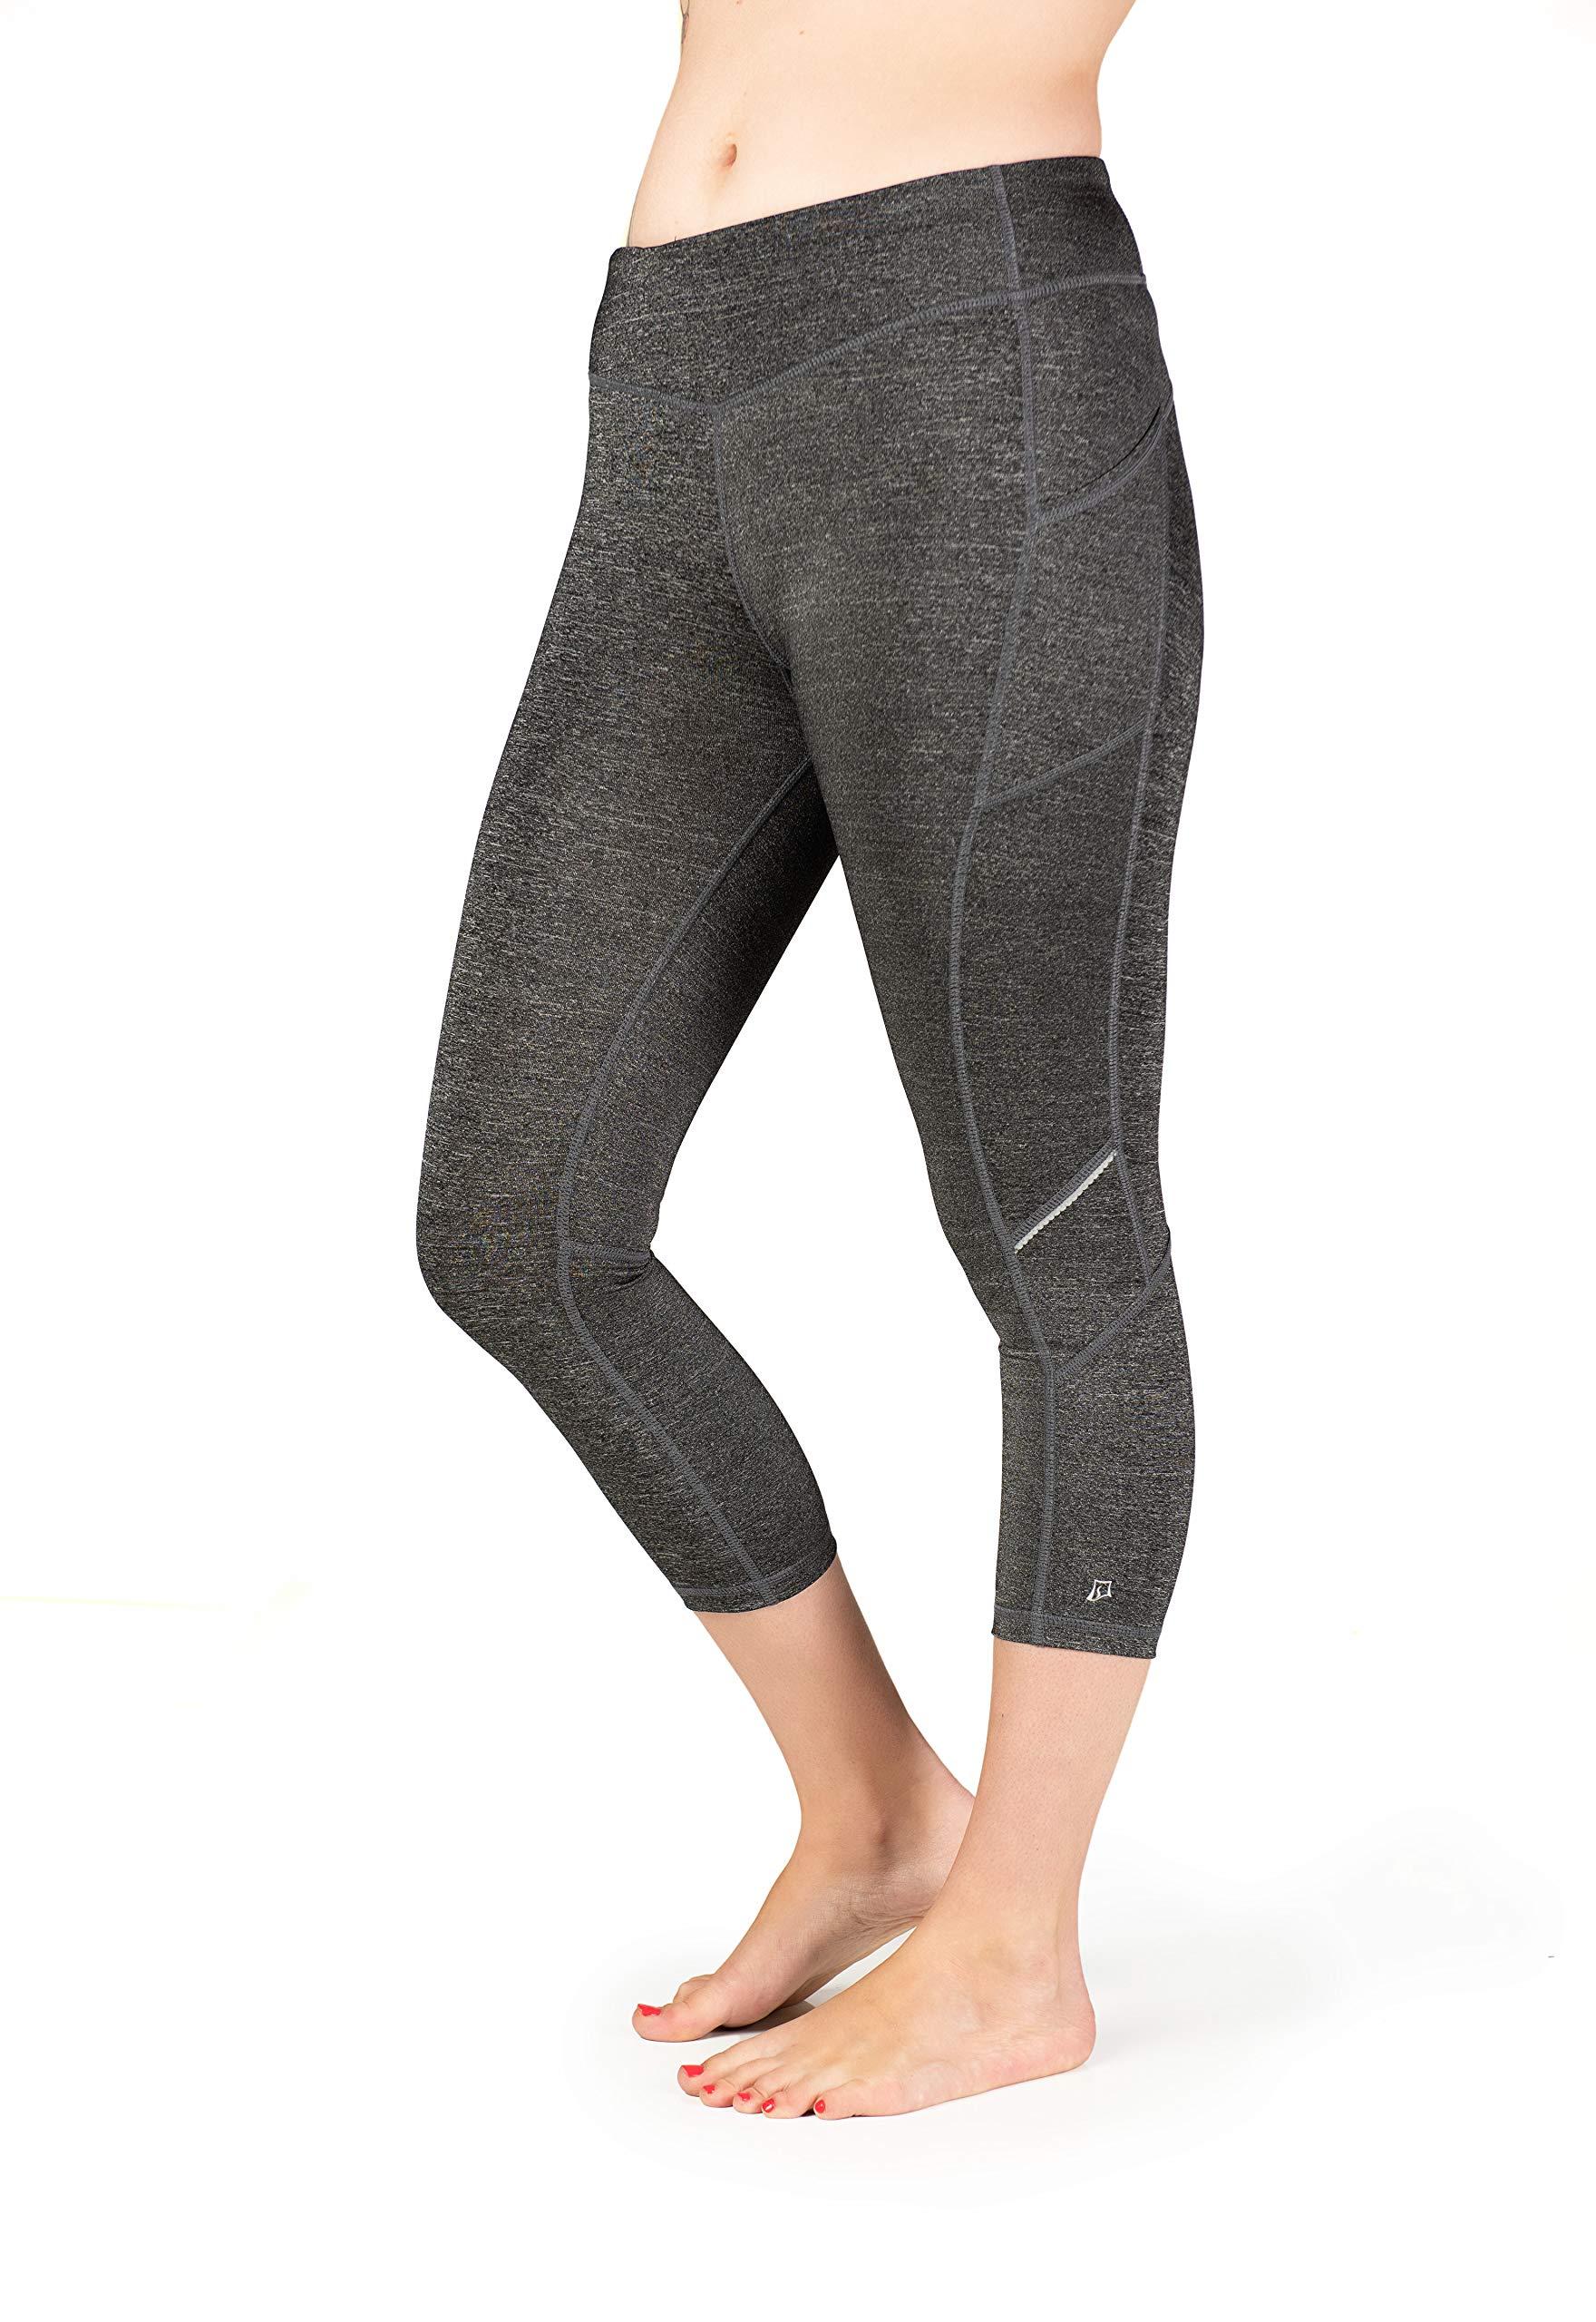 Skirt Sports Women's Pocketopia Capri, Spark, XX-Large by Skirt Sports